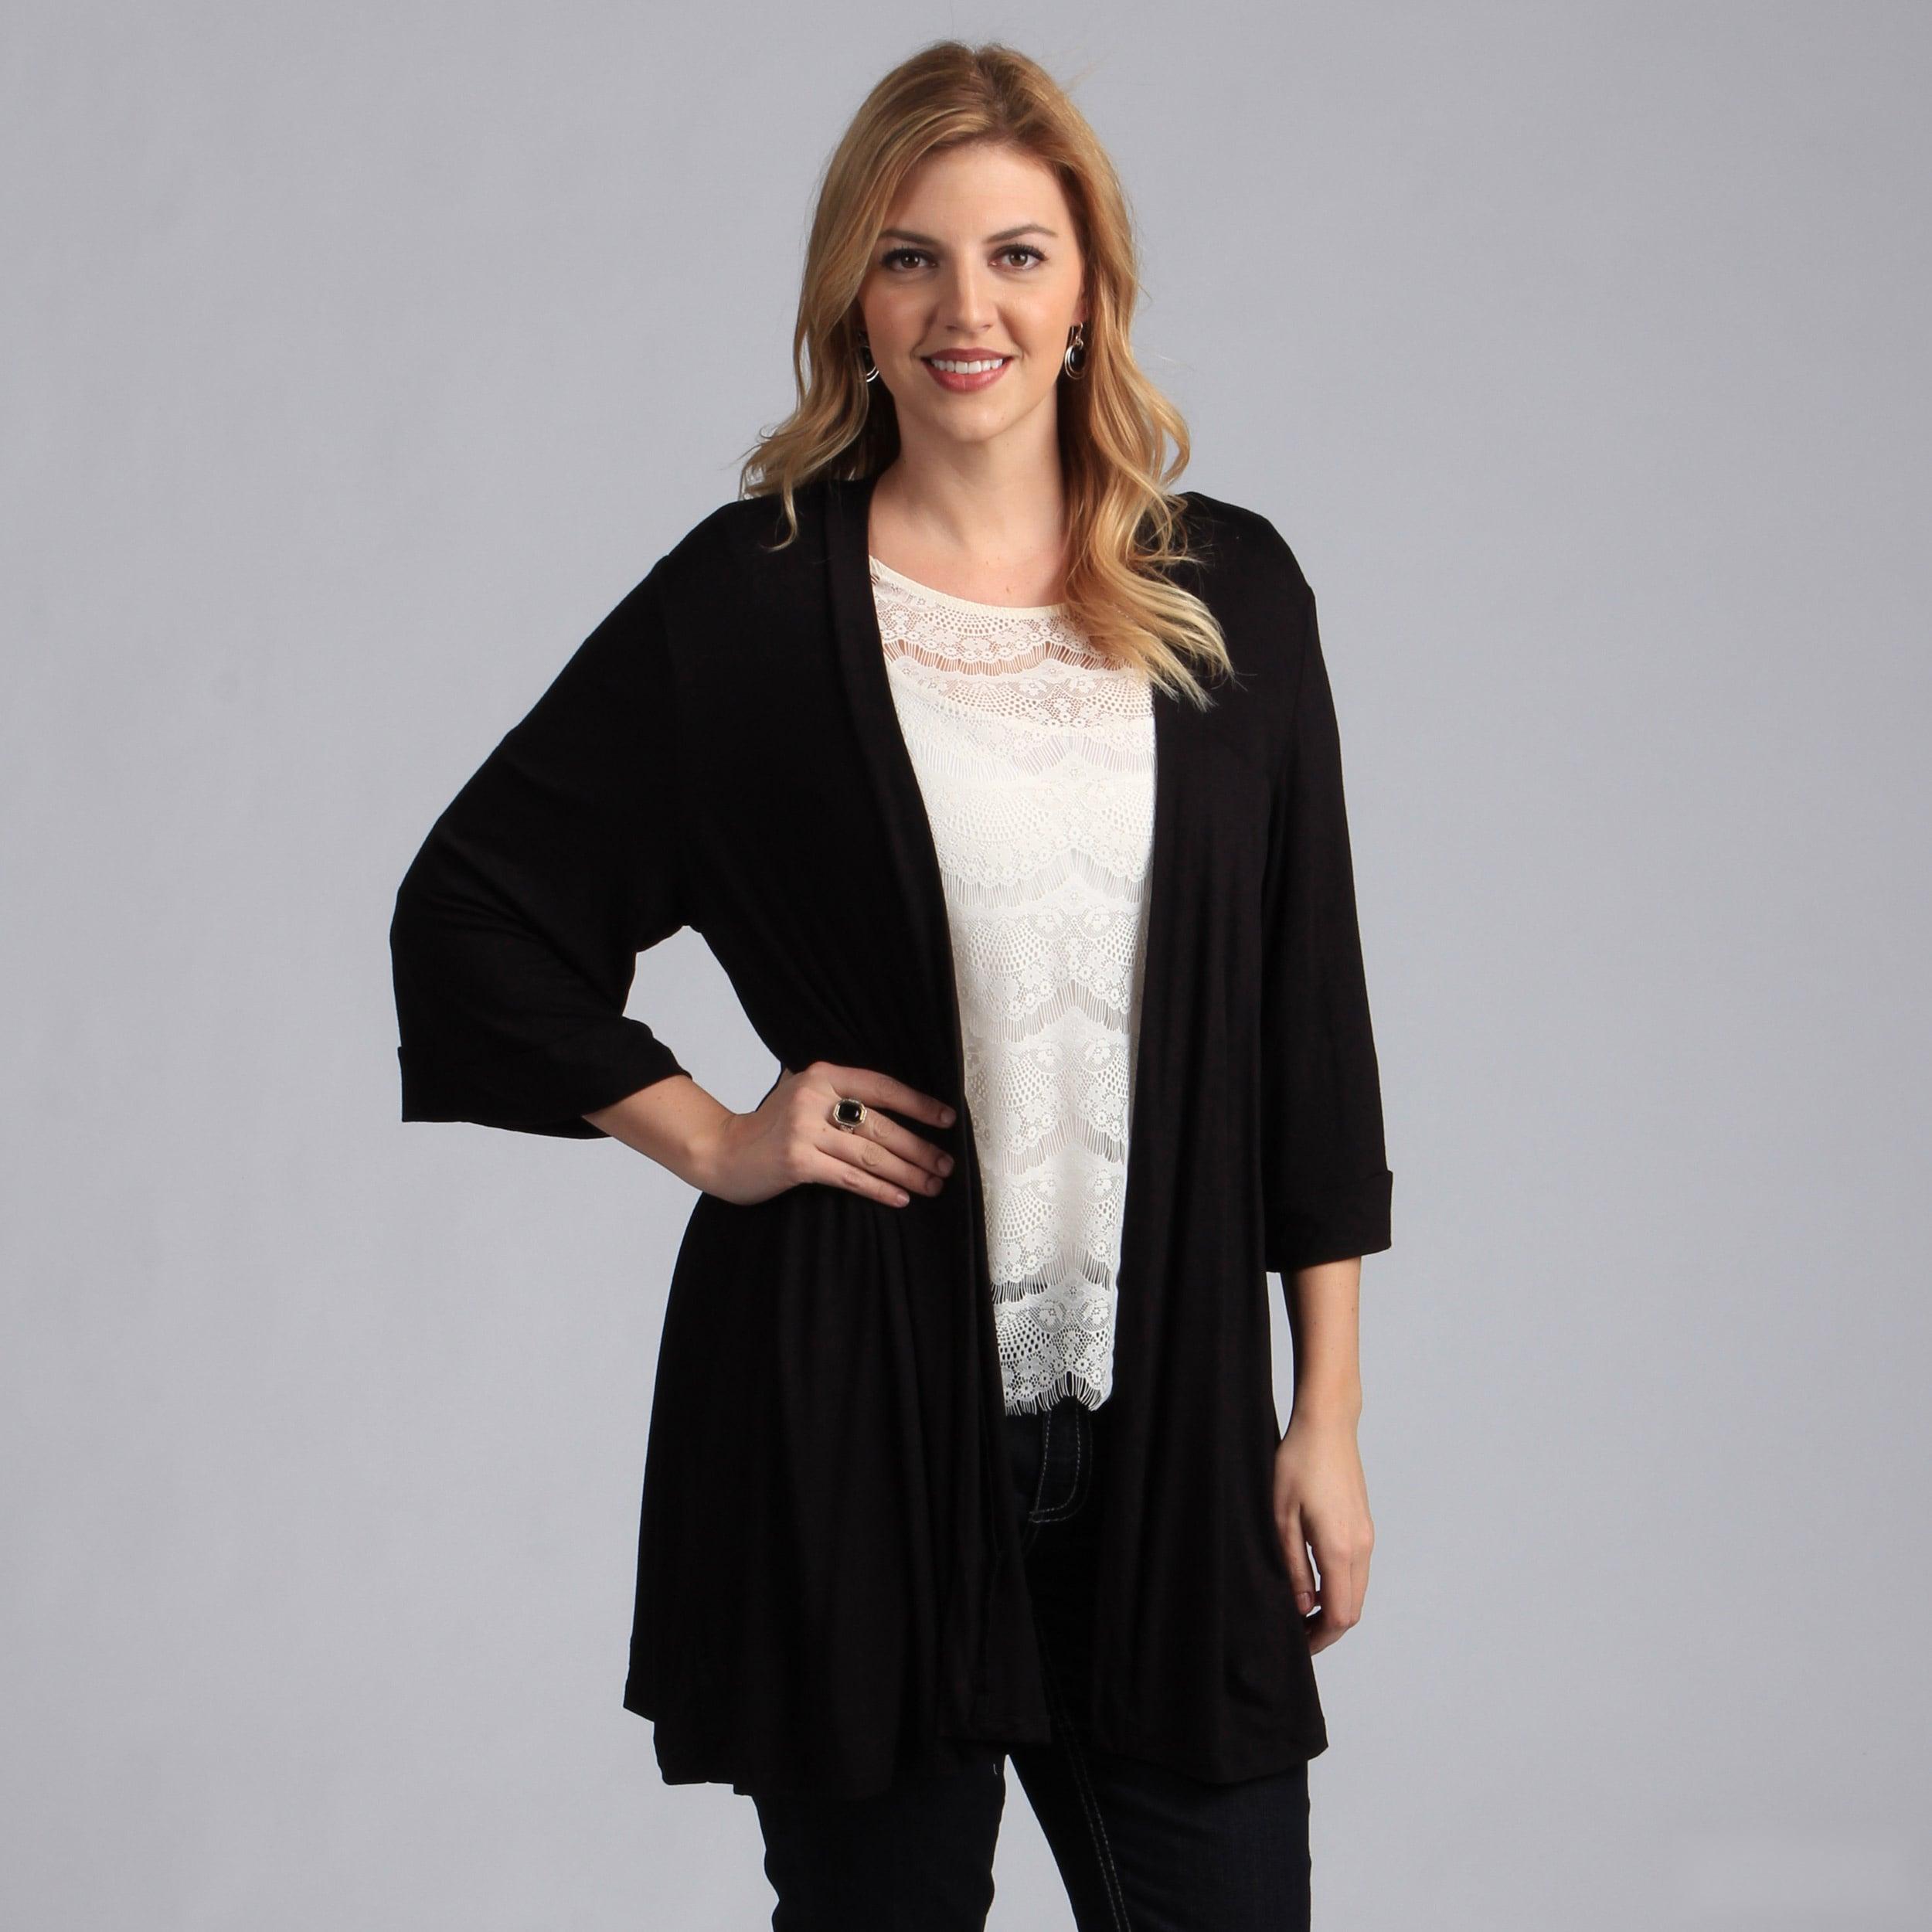 acc4e871b41 Shop 24 7 Comfort Apparel Women s Plus Size Long Shrug - Free ...